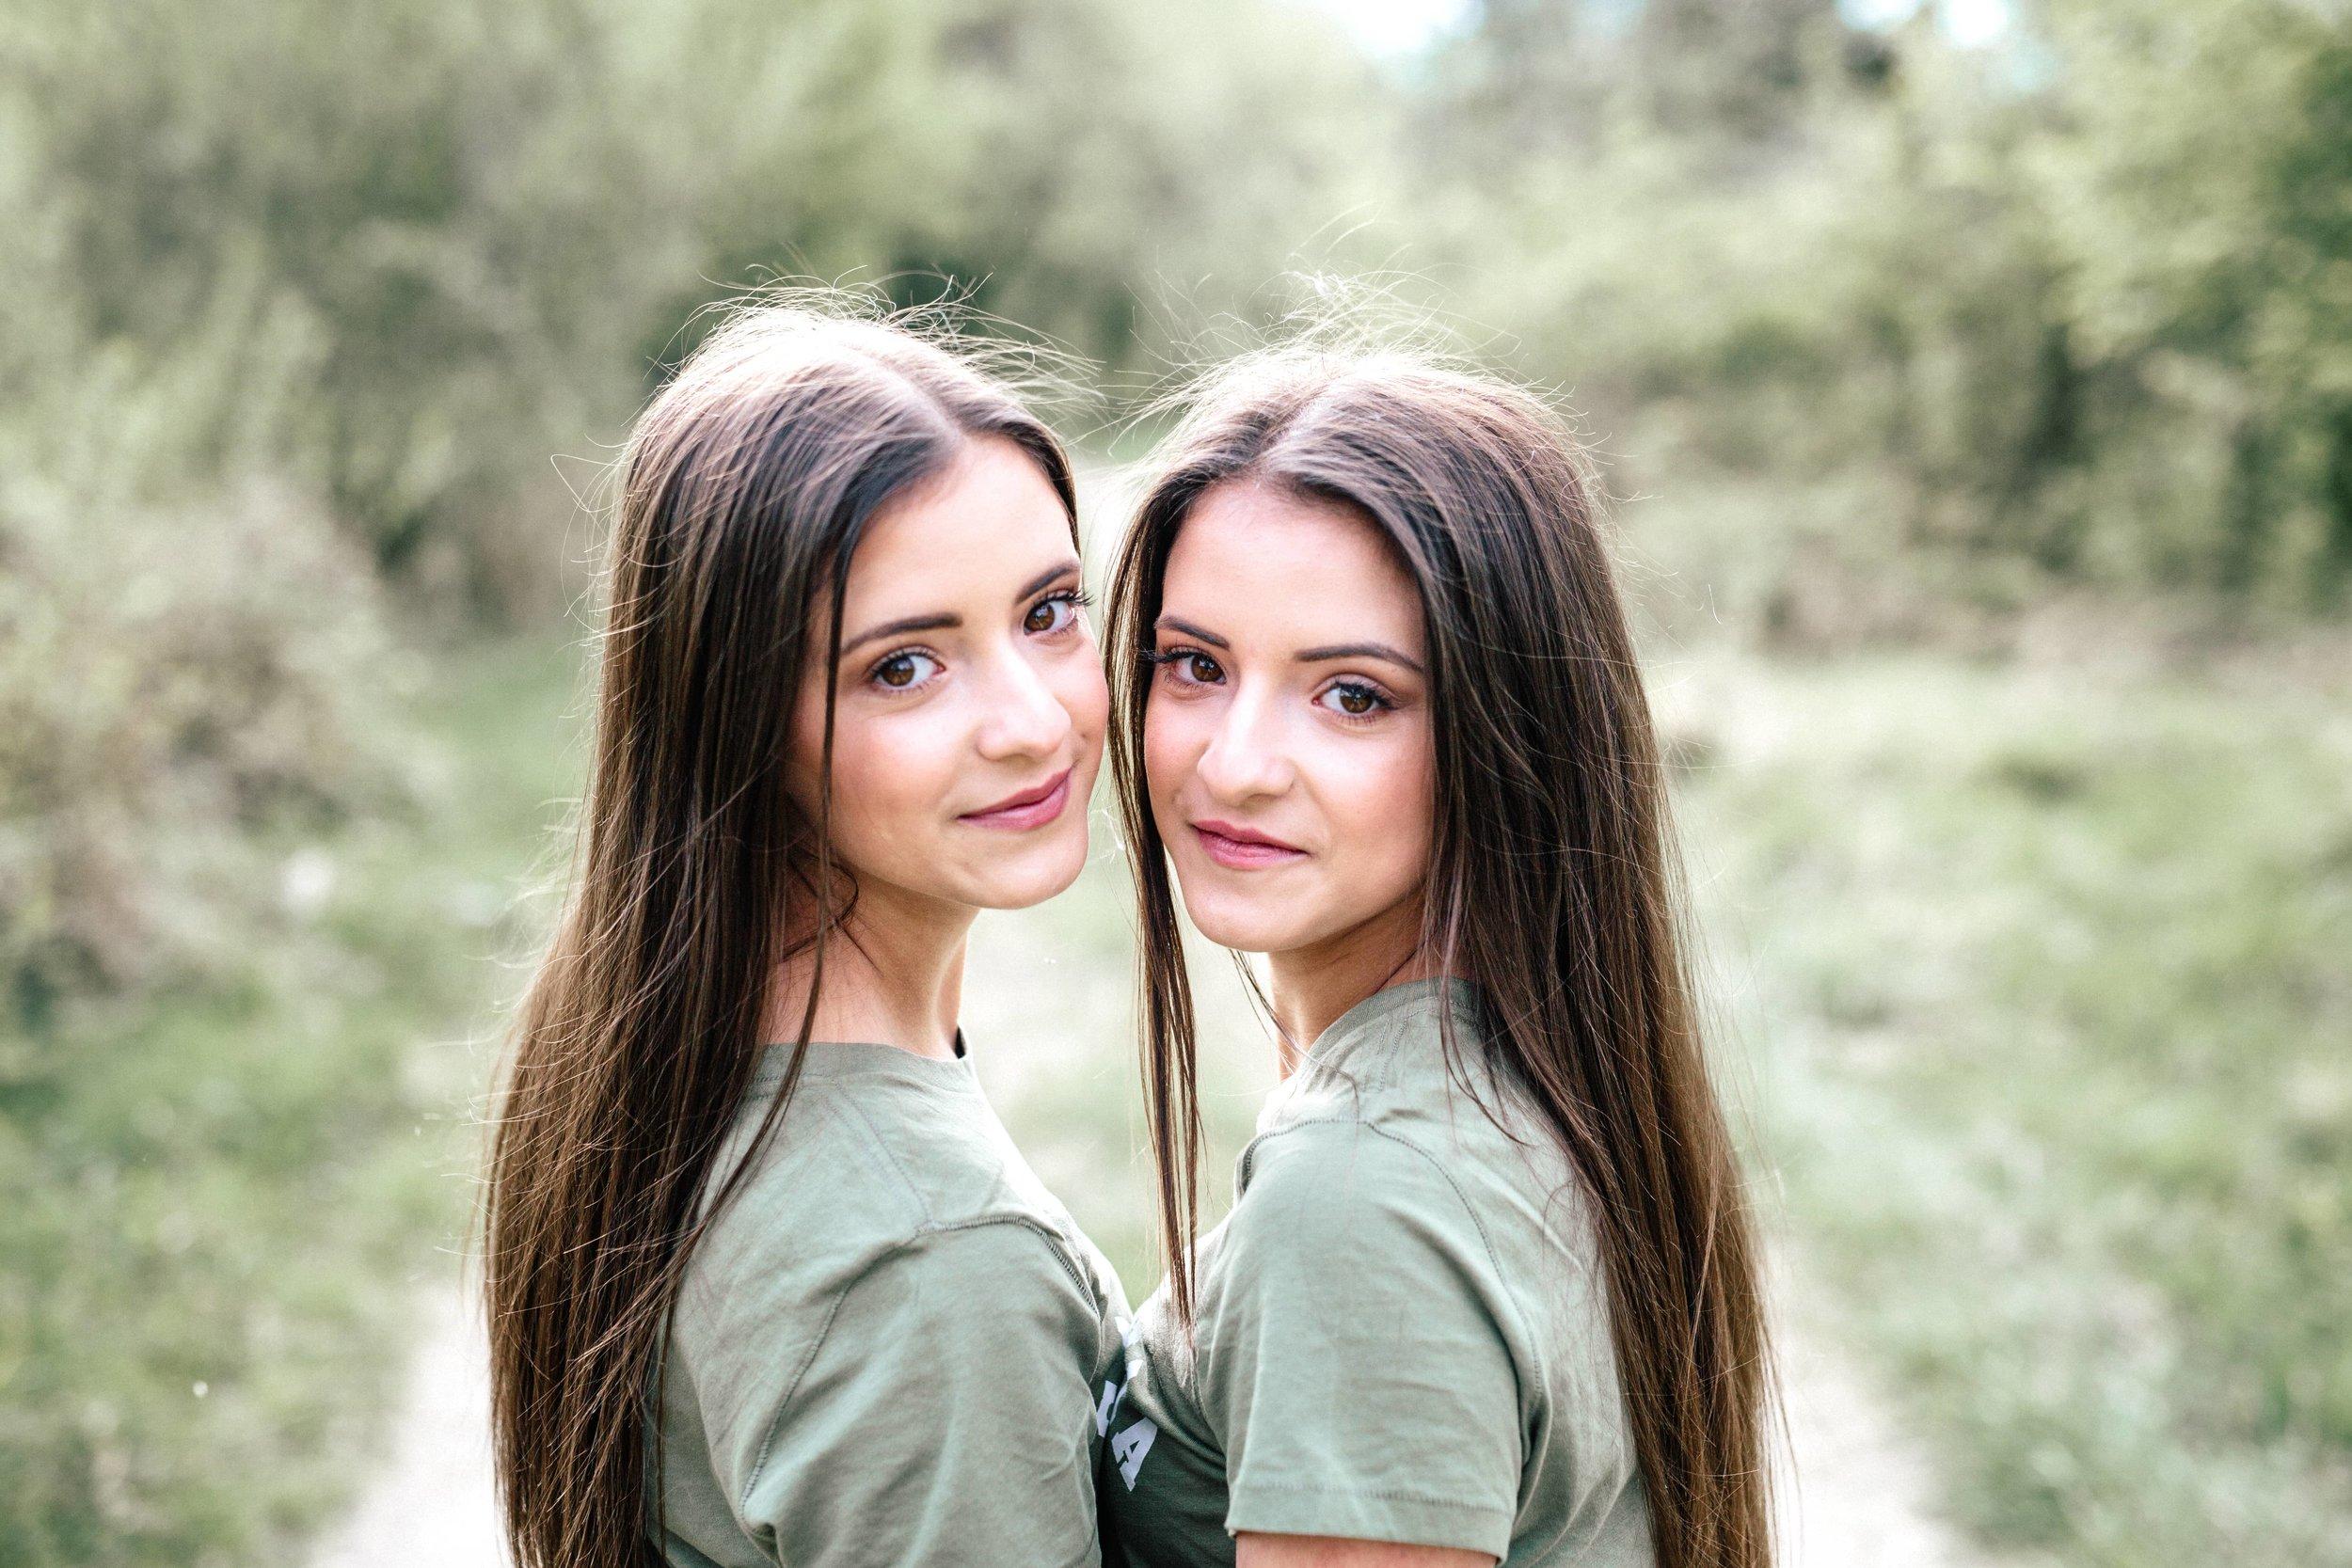 Zwillinge-57.jpg